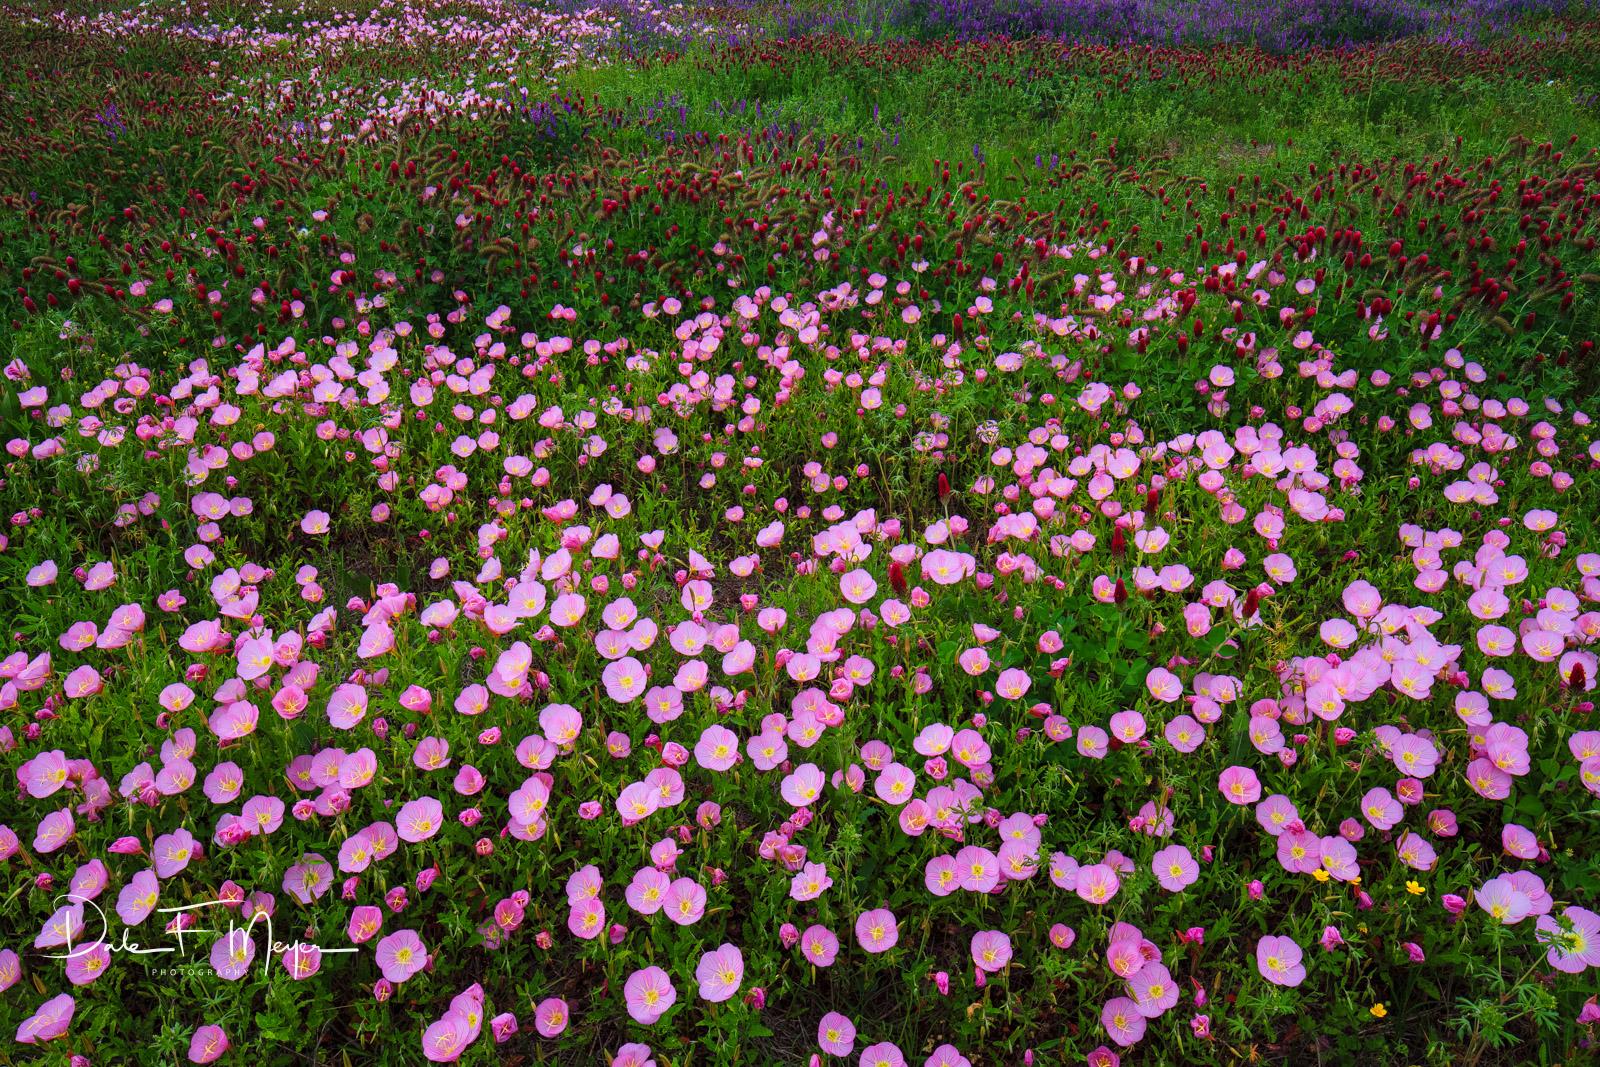 North Arkansas,Showy Evening Primrose,blue bells,crimson clover,flowers,spring 2012,wildflower meadow, photo